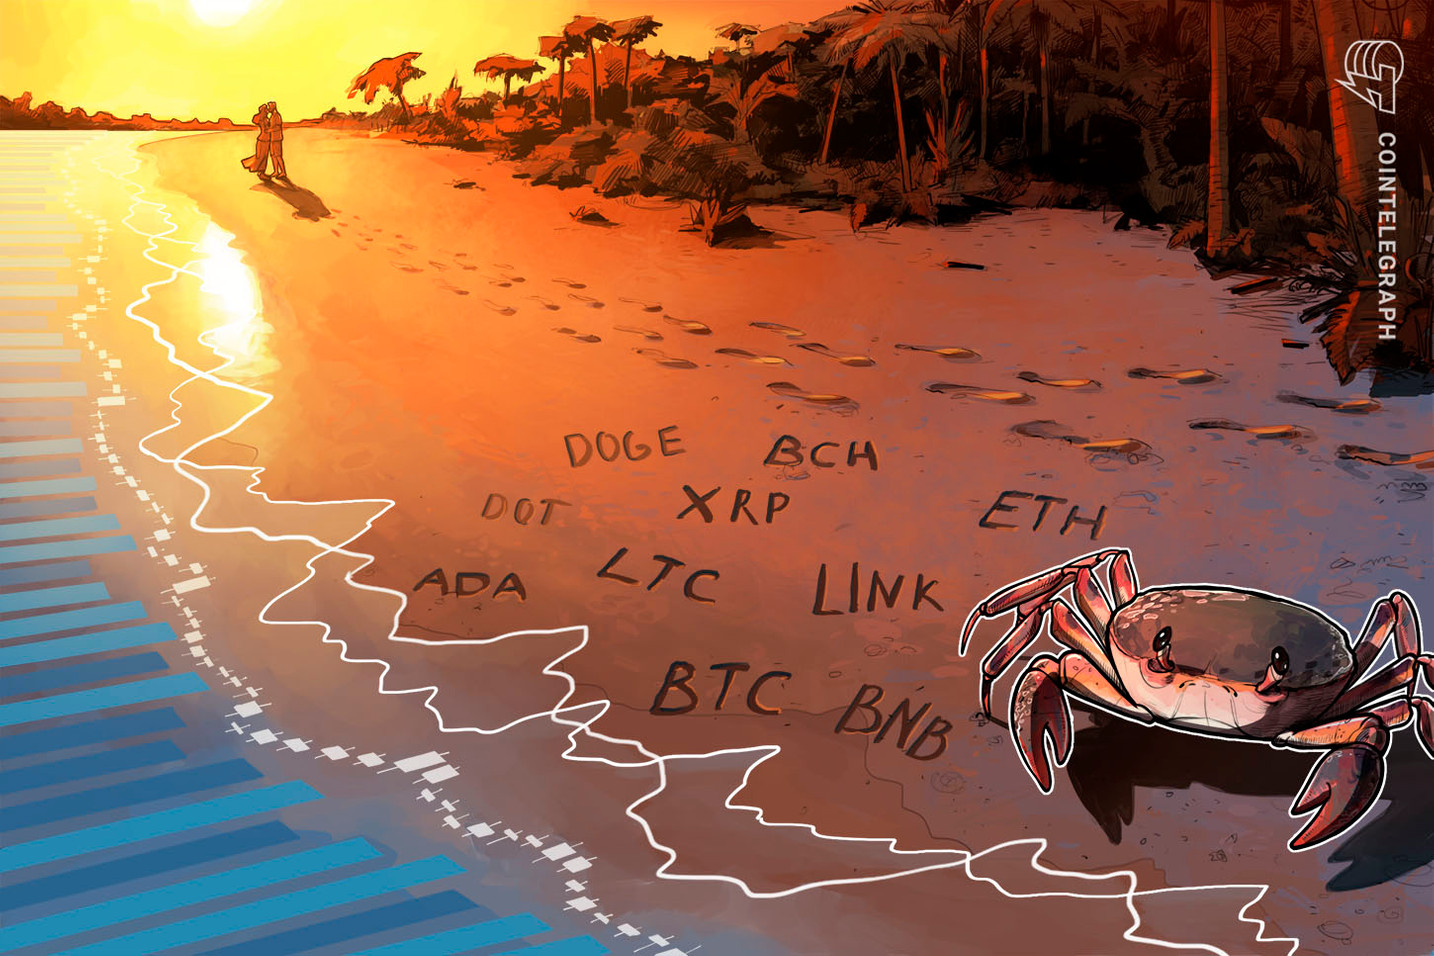 Análisis de precios del 10 de mayo: BTC, ETH, BNB, DOGE, XRP, ADA, DOT, BCH, LTC, LINK